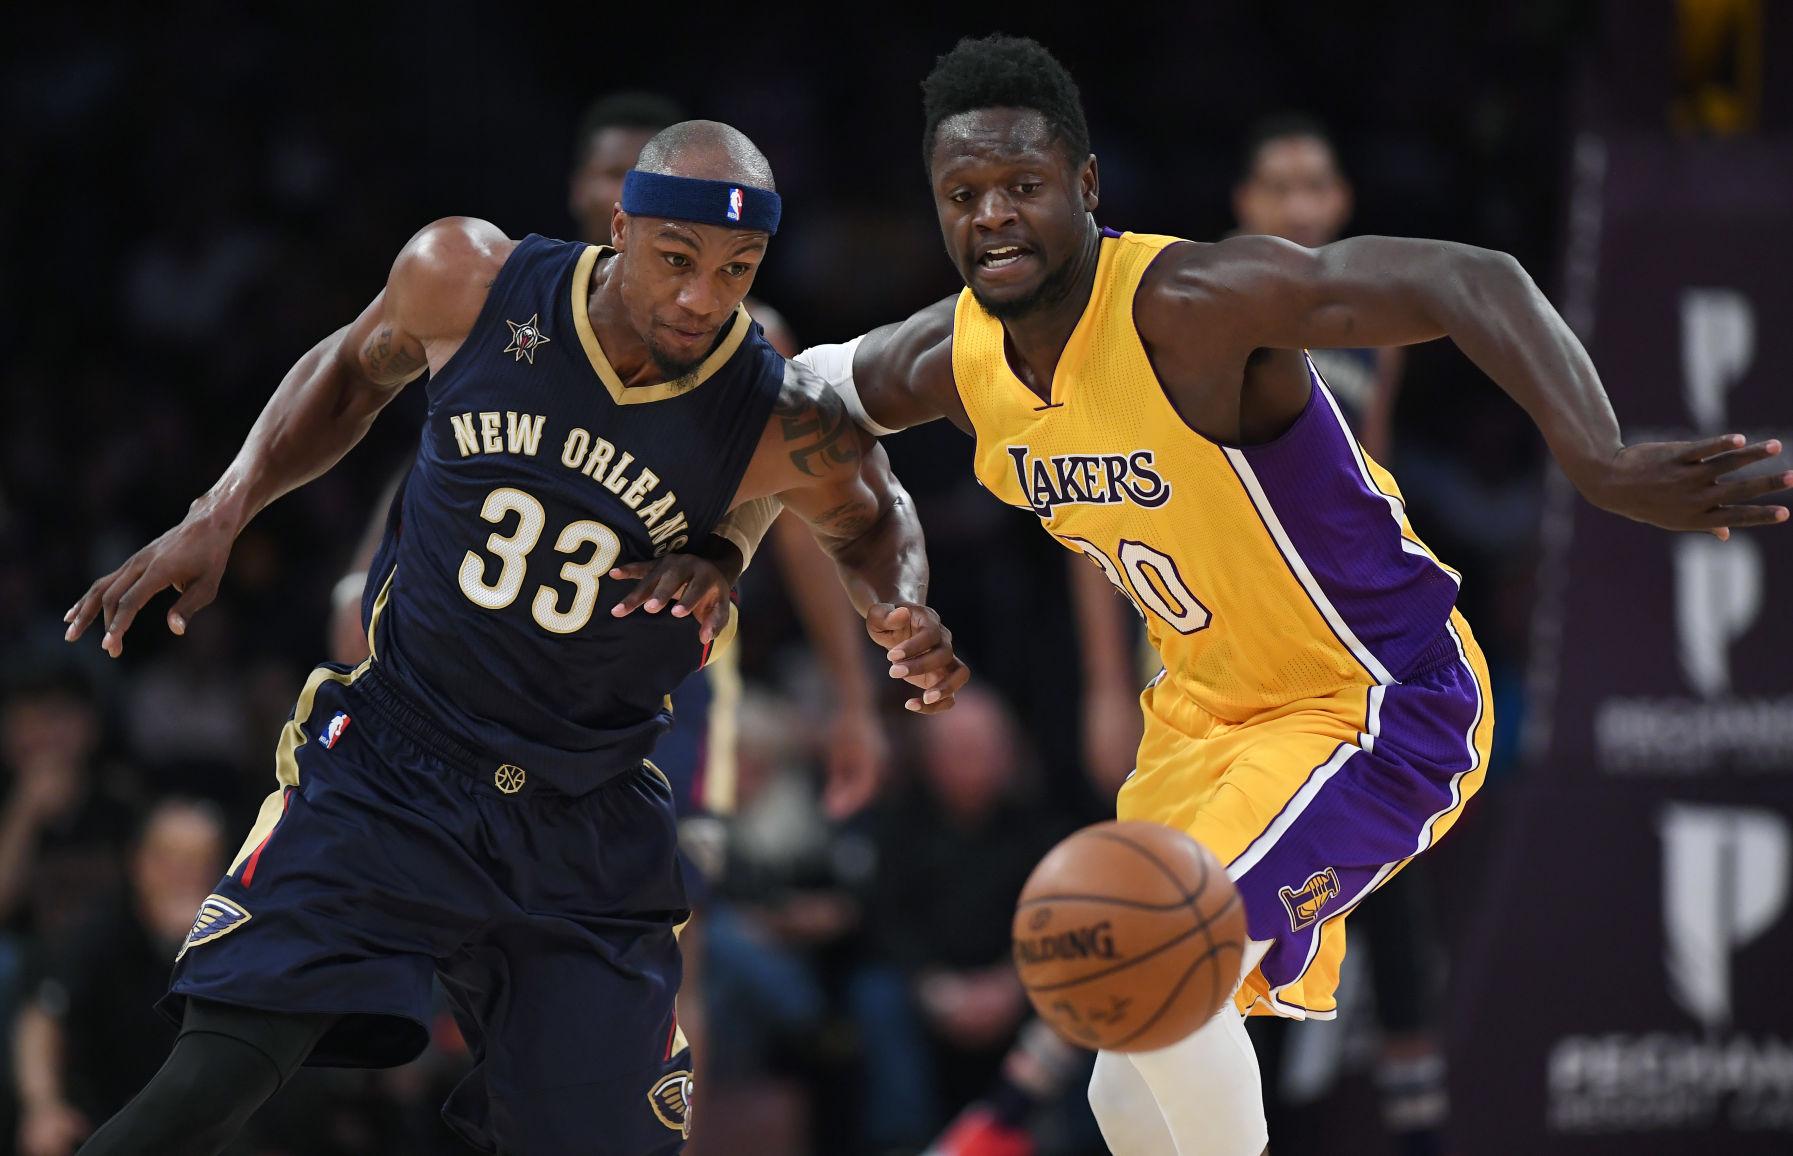 Pelicans bringing back forward Cunningham